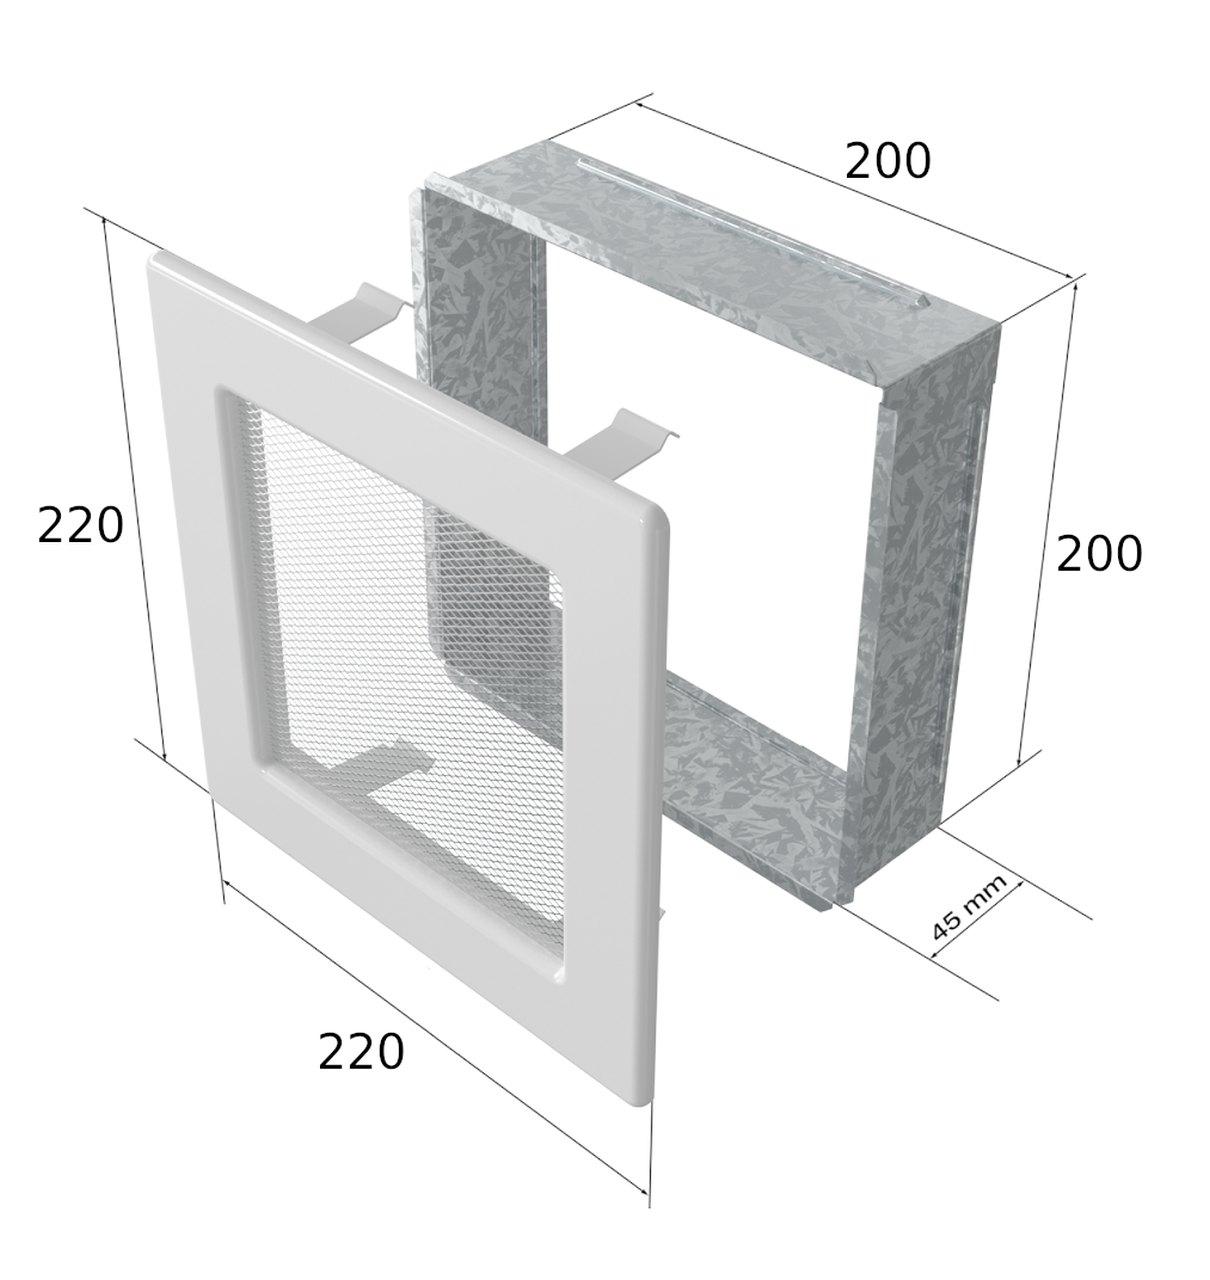 a9fb4c4257422ac15a4b0e91a3f48669.jpg (1013×1072)